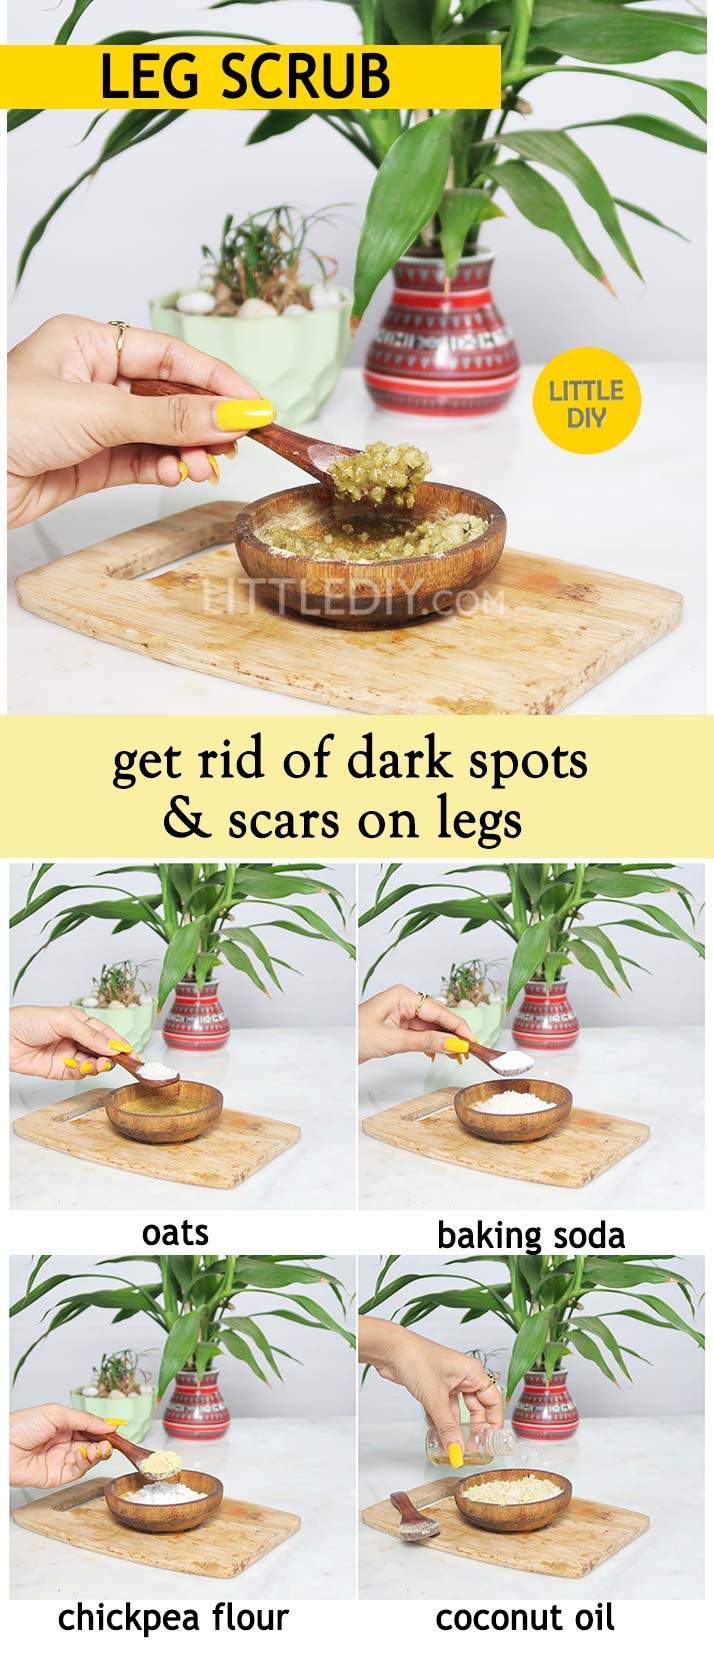 LEG SCRUB